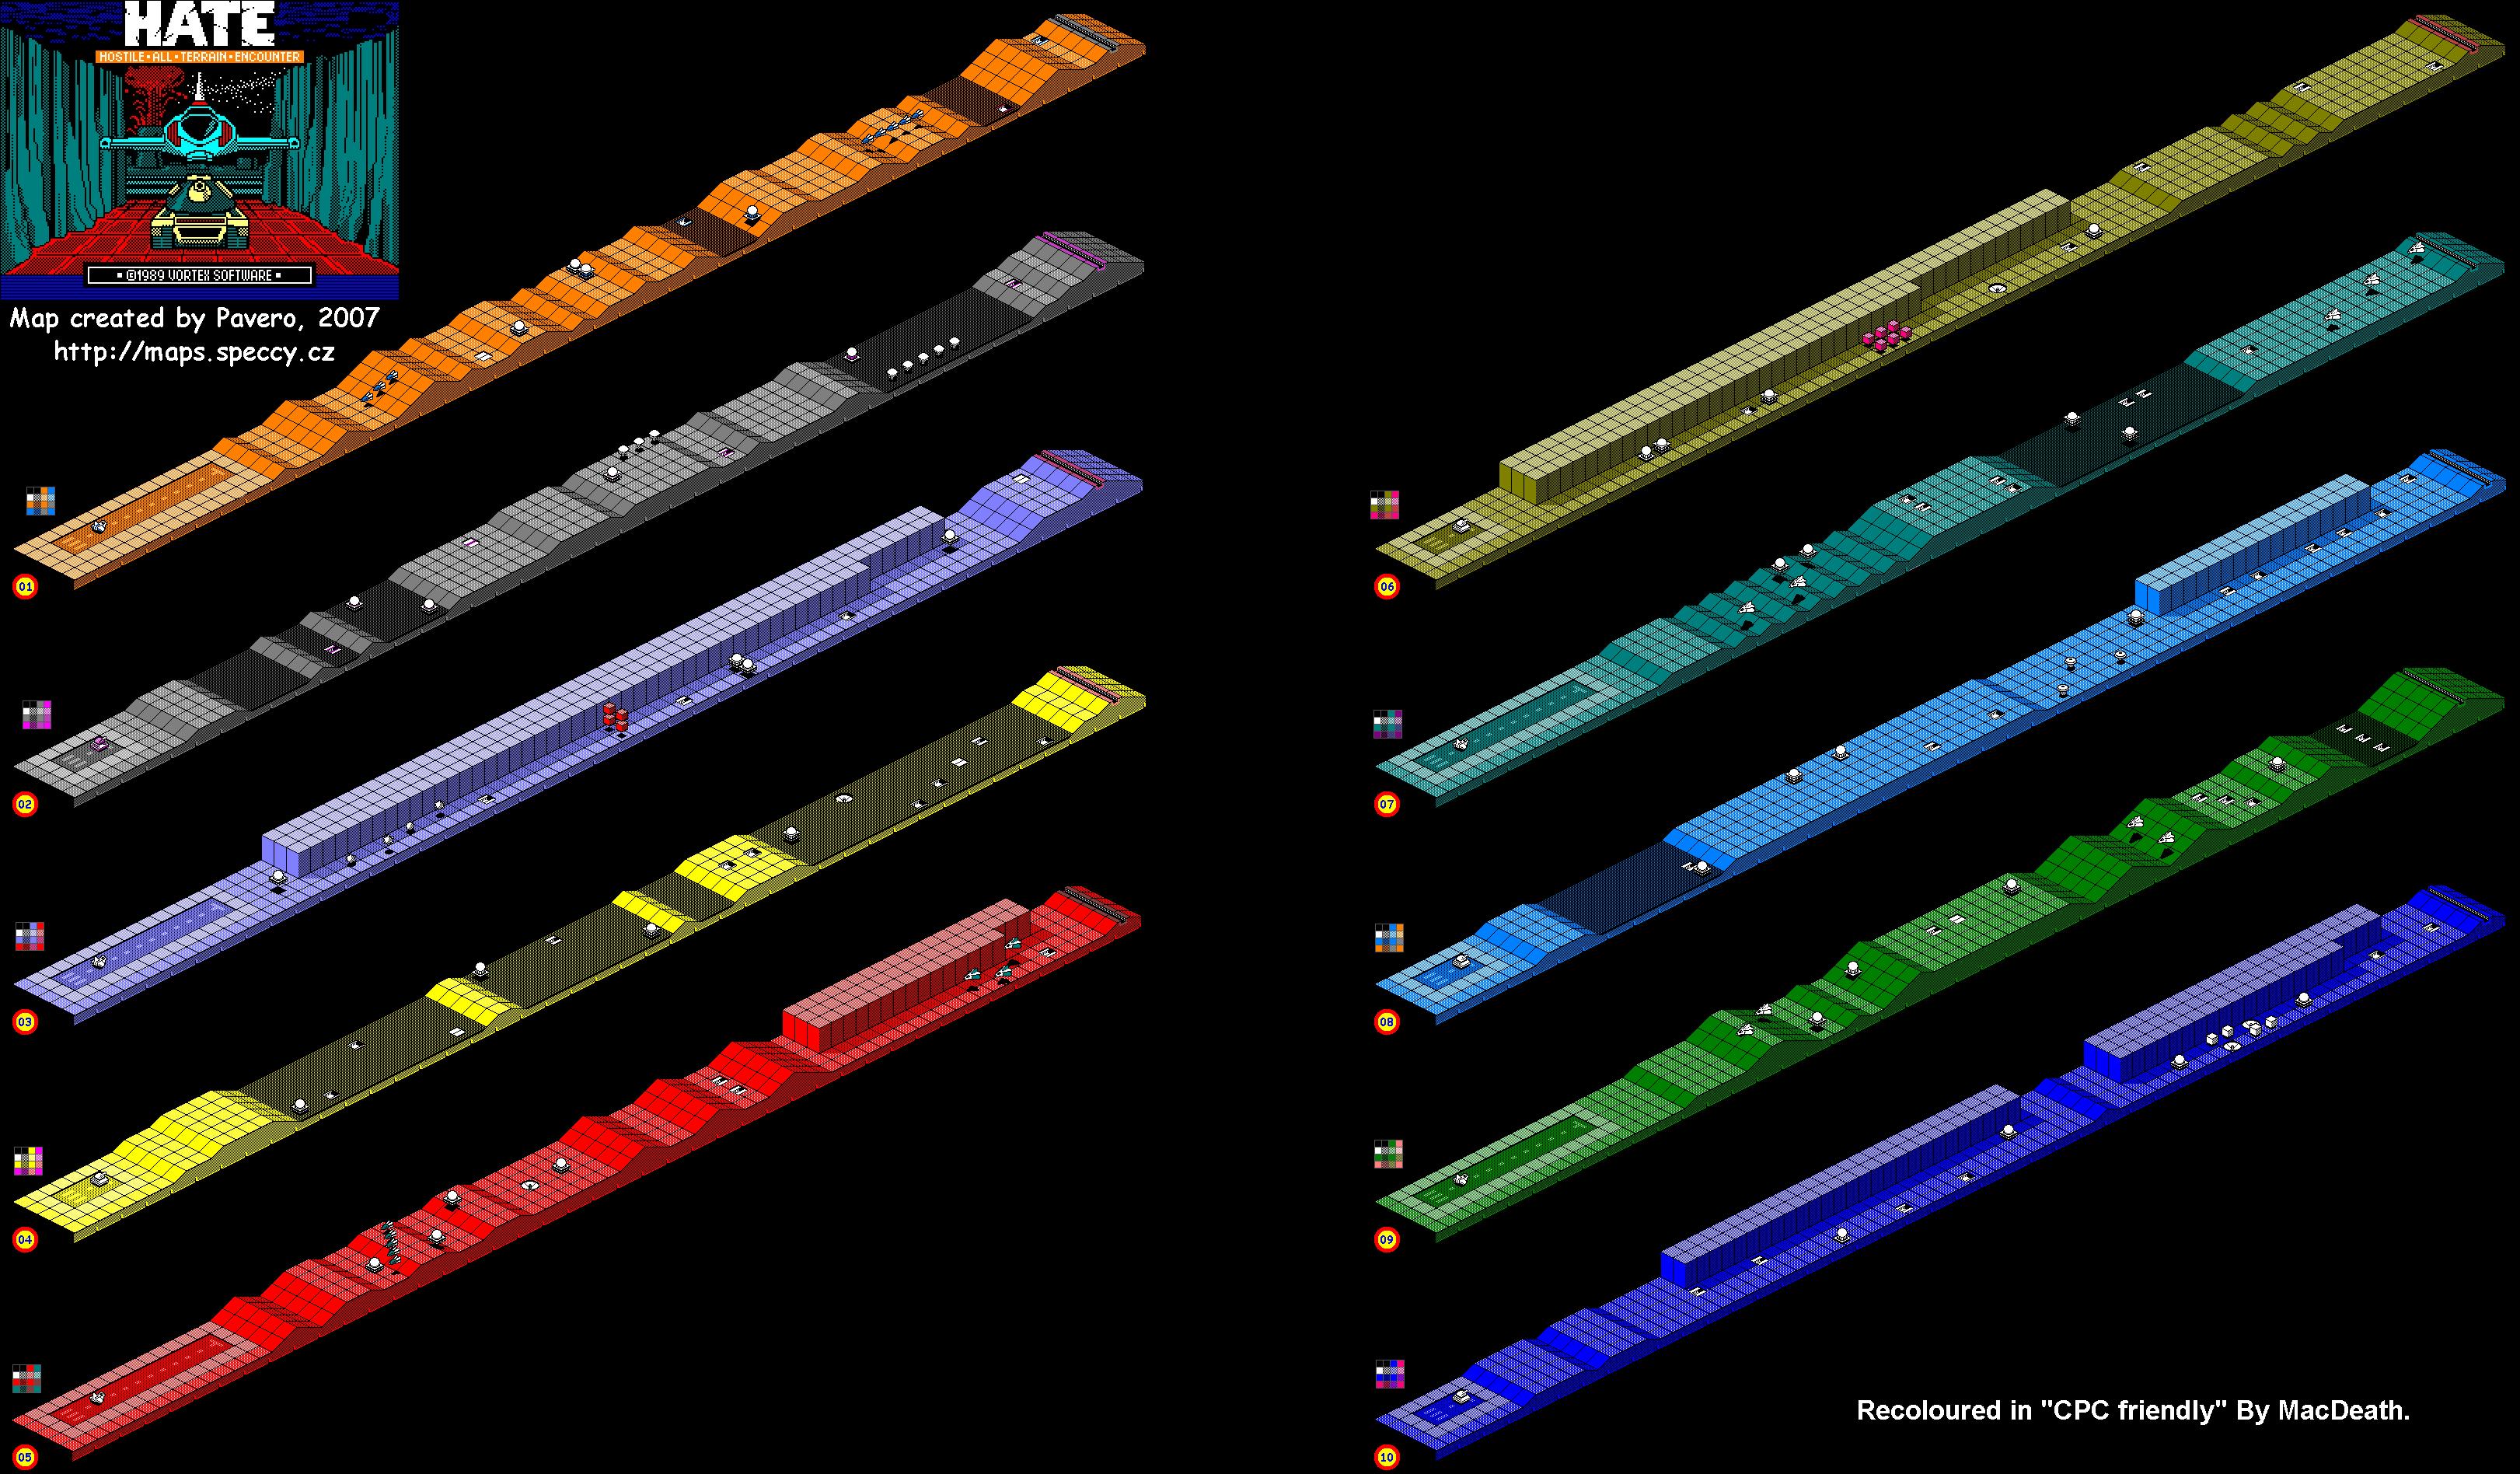 ZX spectrum vs CPC Amstrad - Page 3 Hate_c11